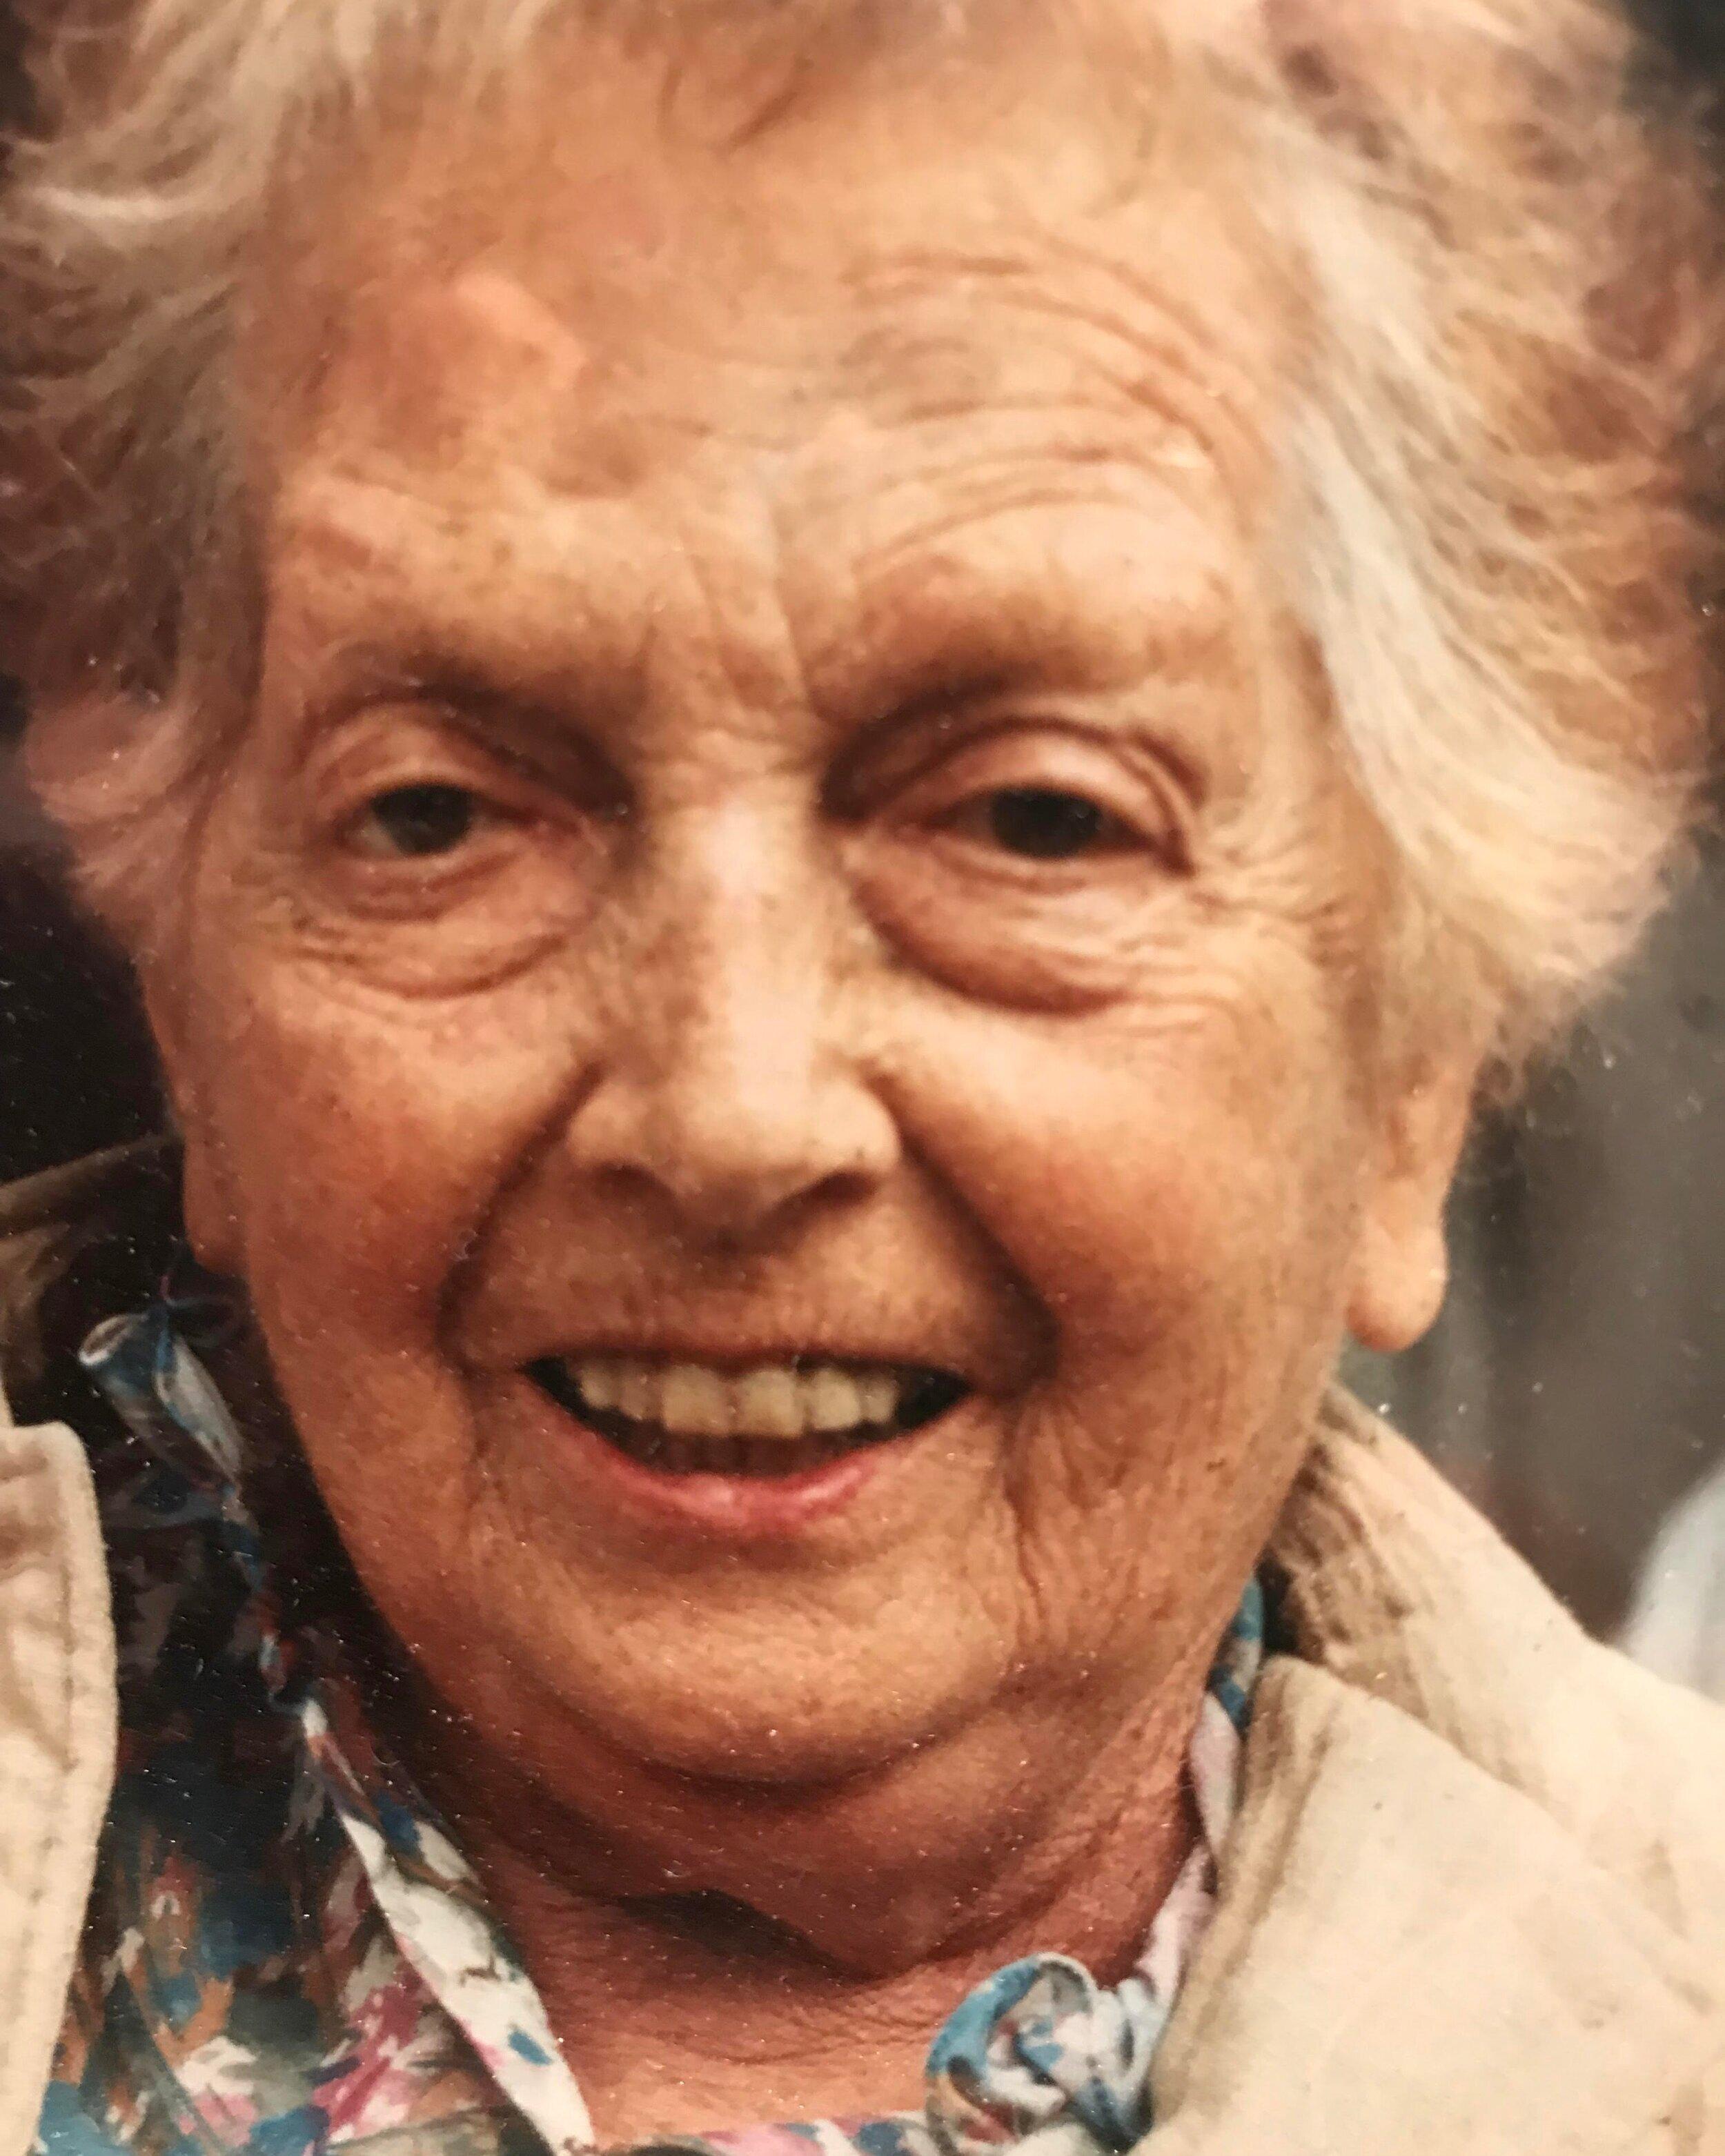 Rebecca's grandmother, Klara Magrit